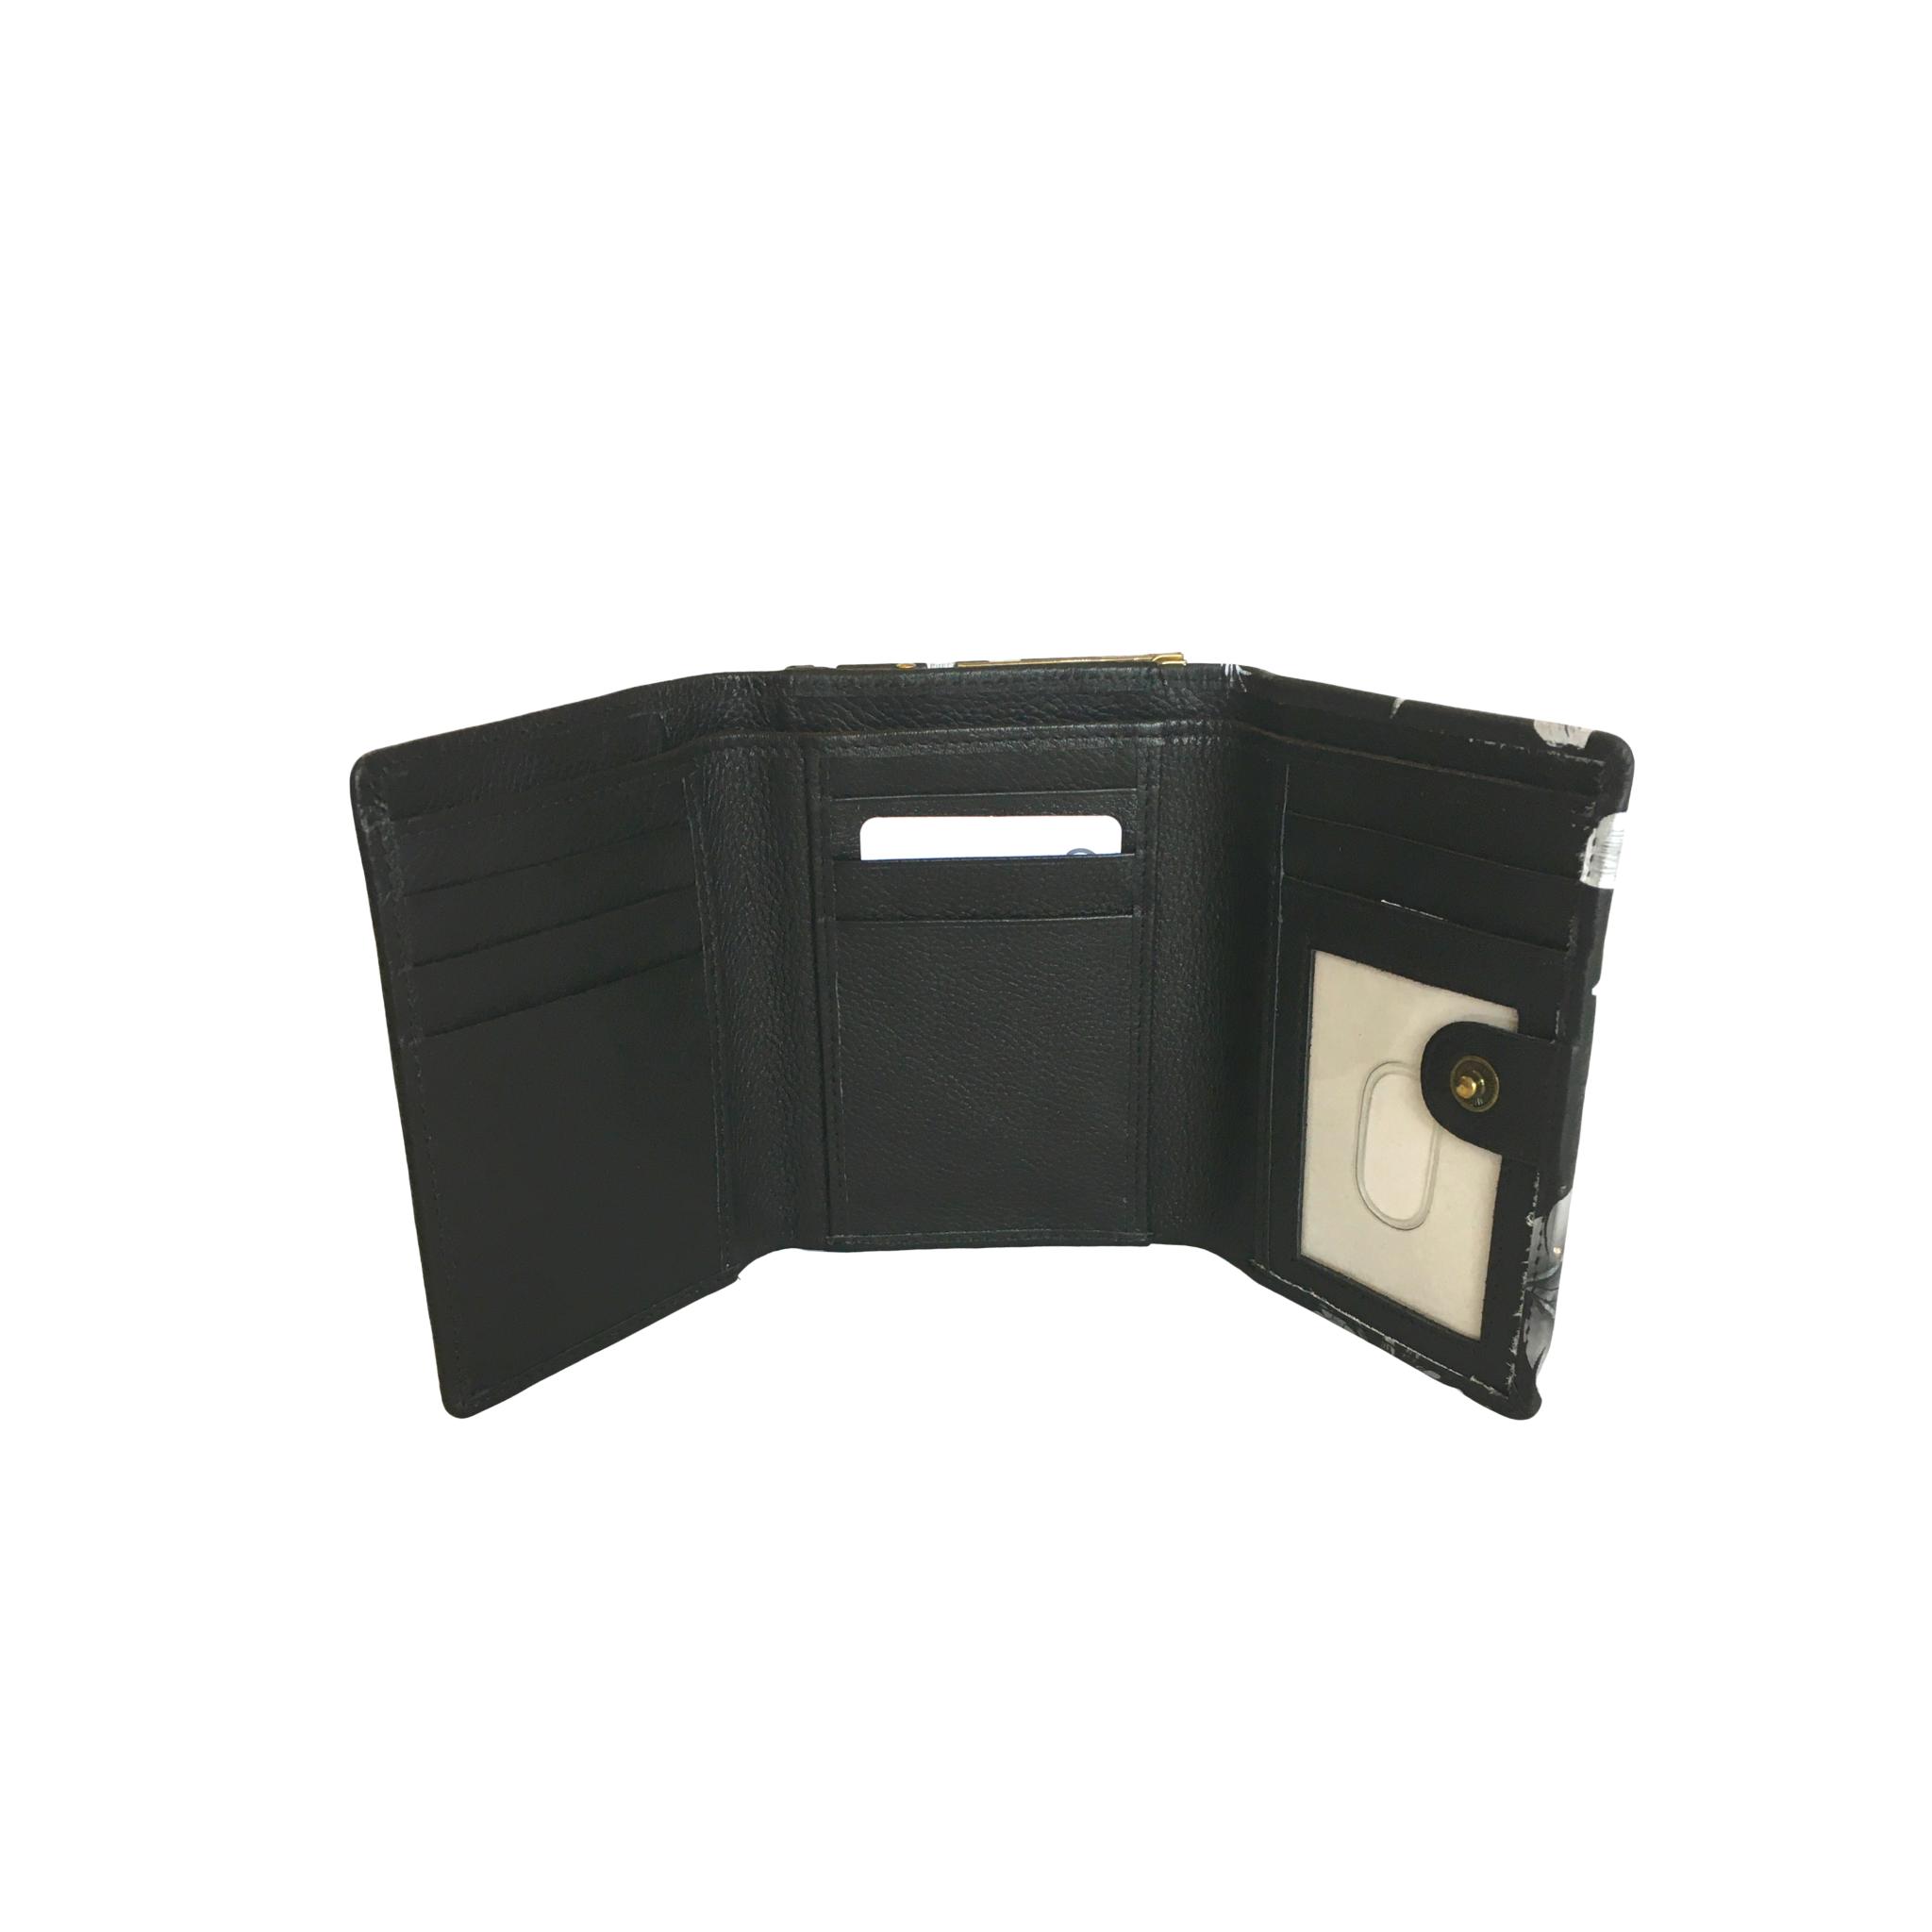 Anuschka small triple fold wallet with RFID 1138 clp